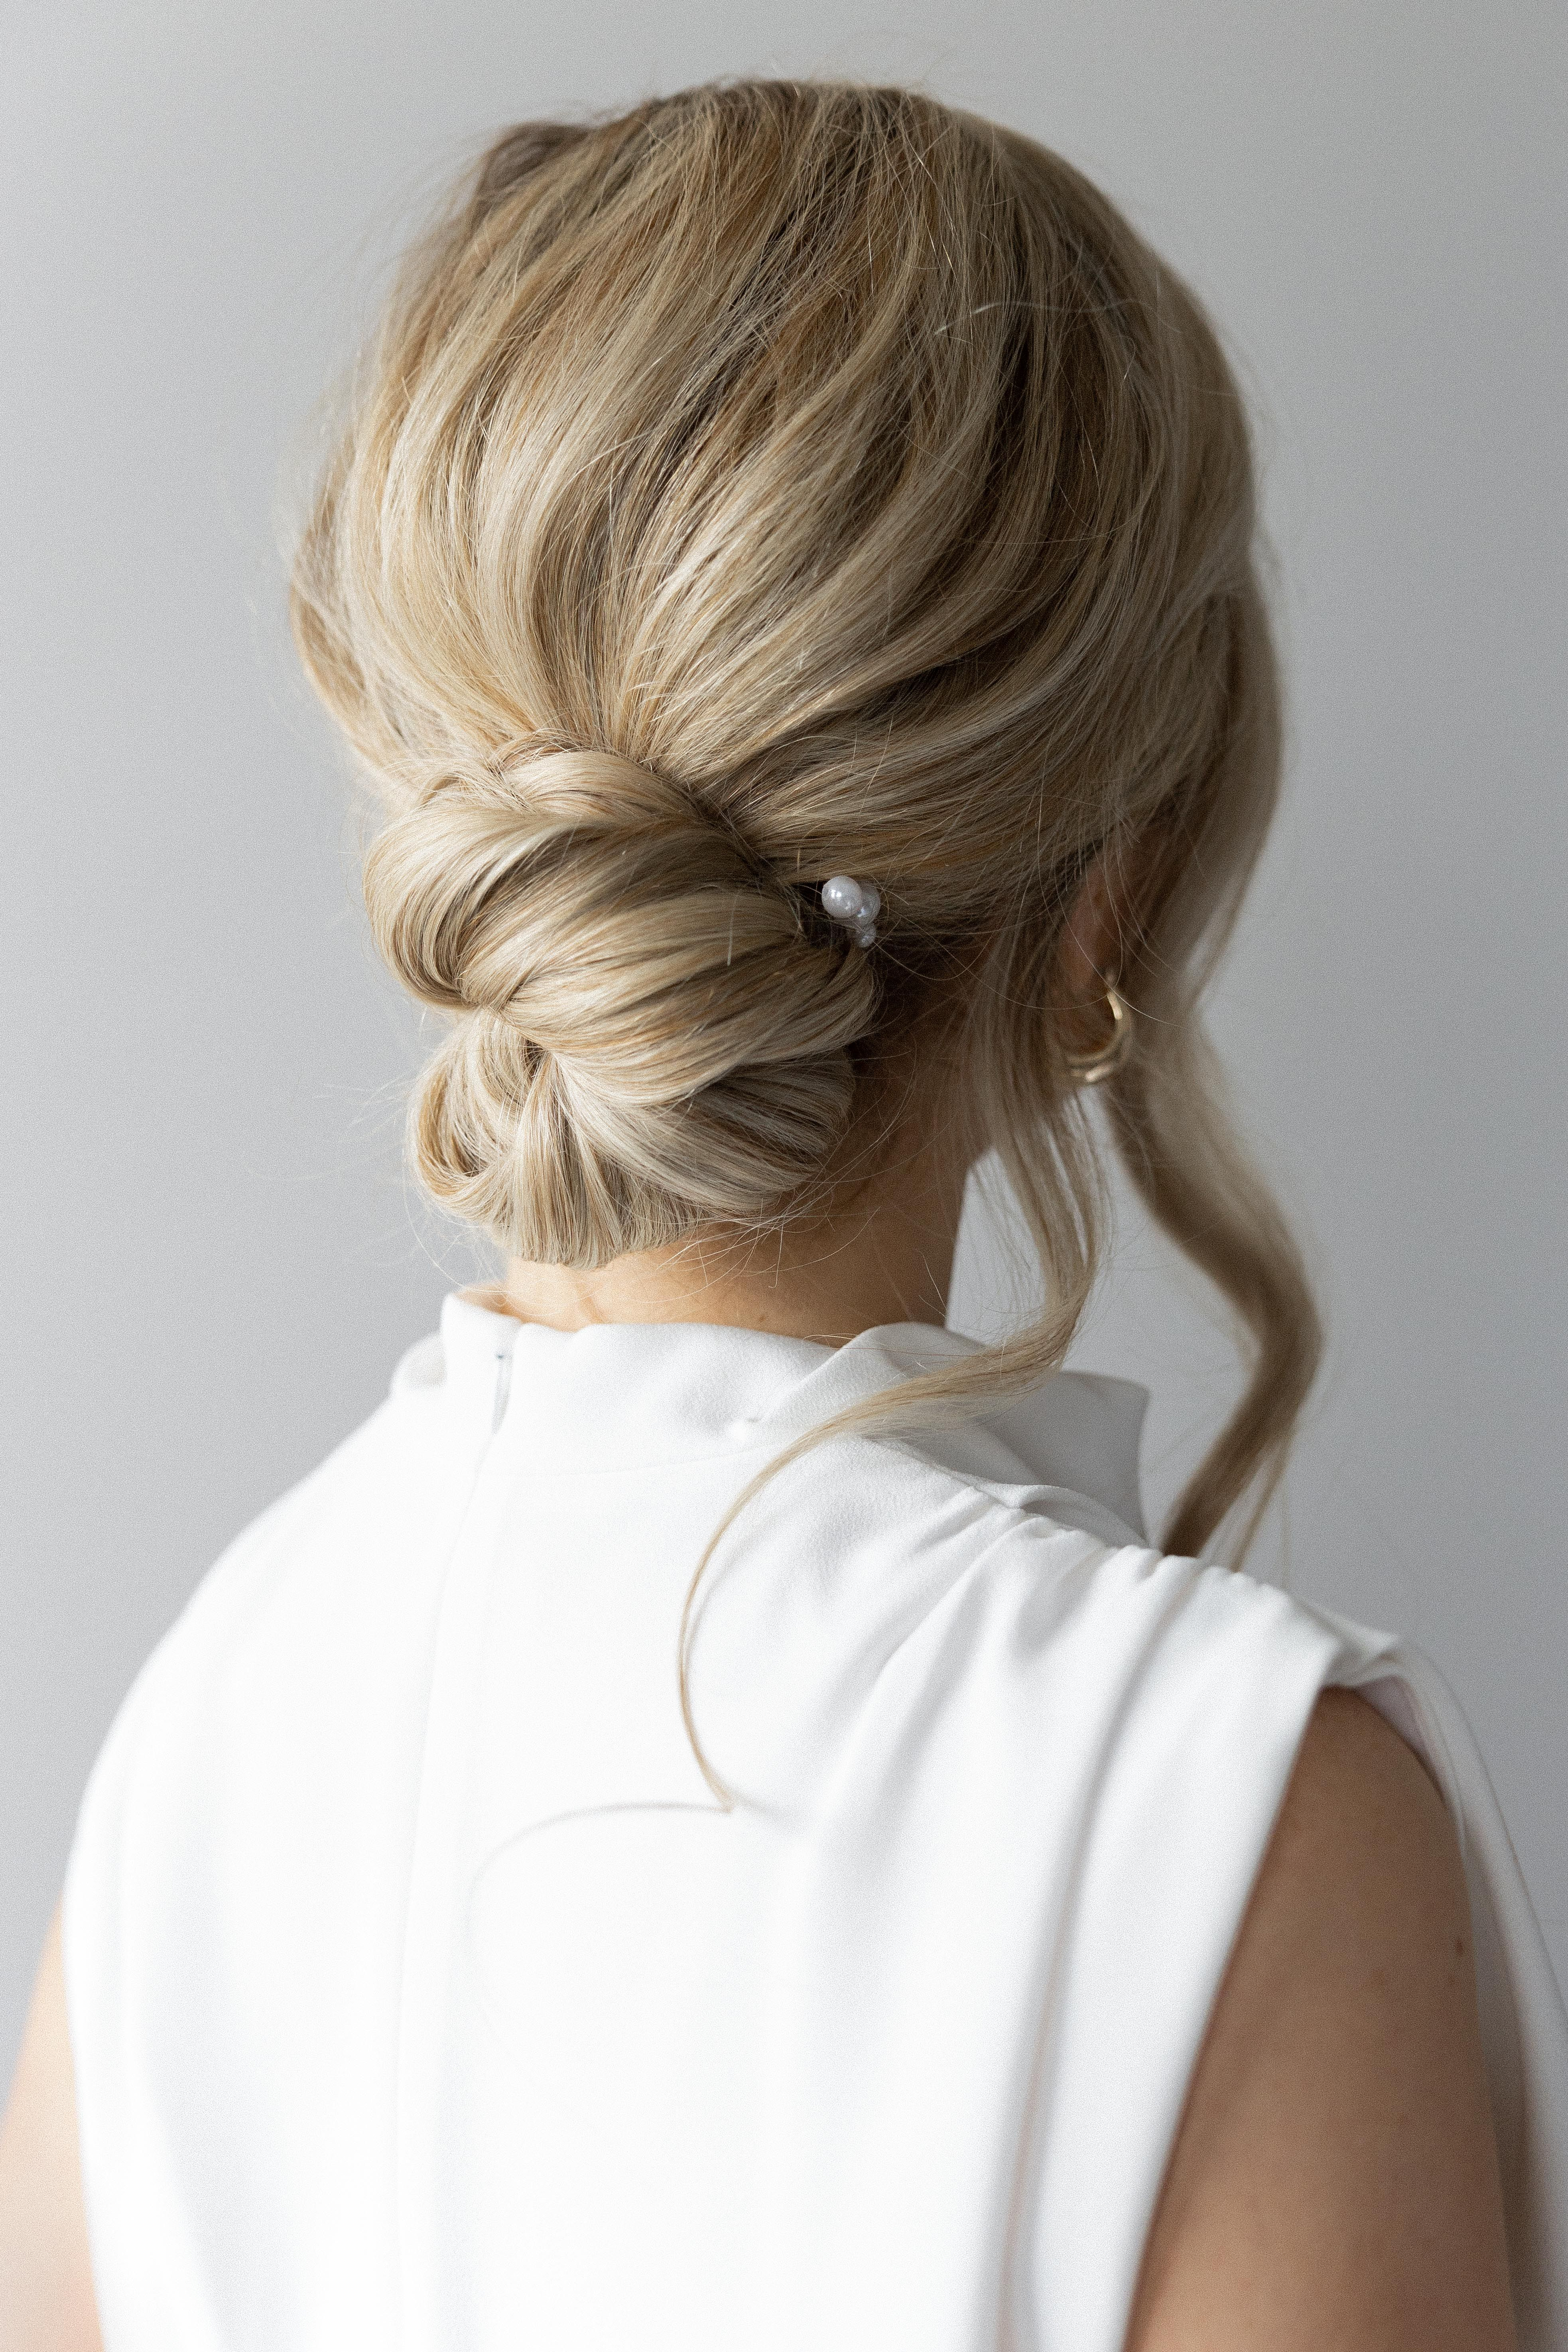 Easy Updo Hairstyle Long Medium Hair Wedding Prom Bridal In 2020 Easy Updo Hairstyles Medium Hair Styles Hair Tutorials For Medium Hair